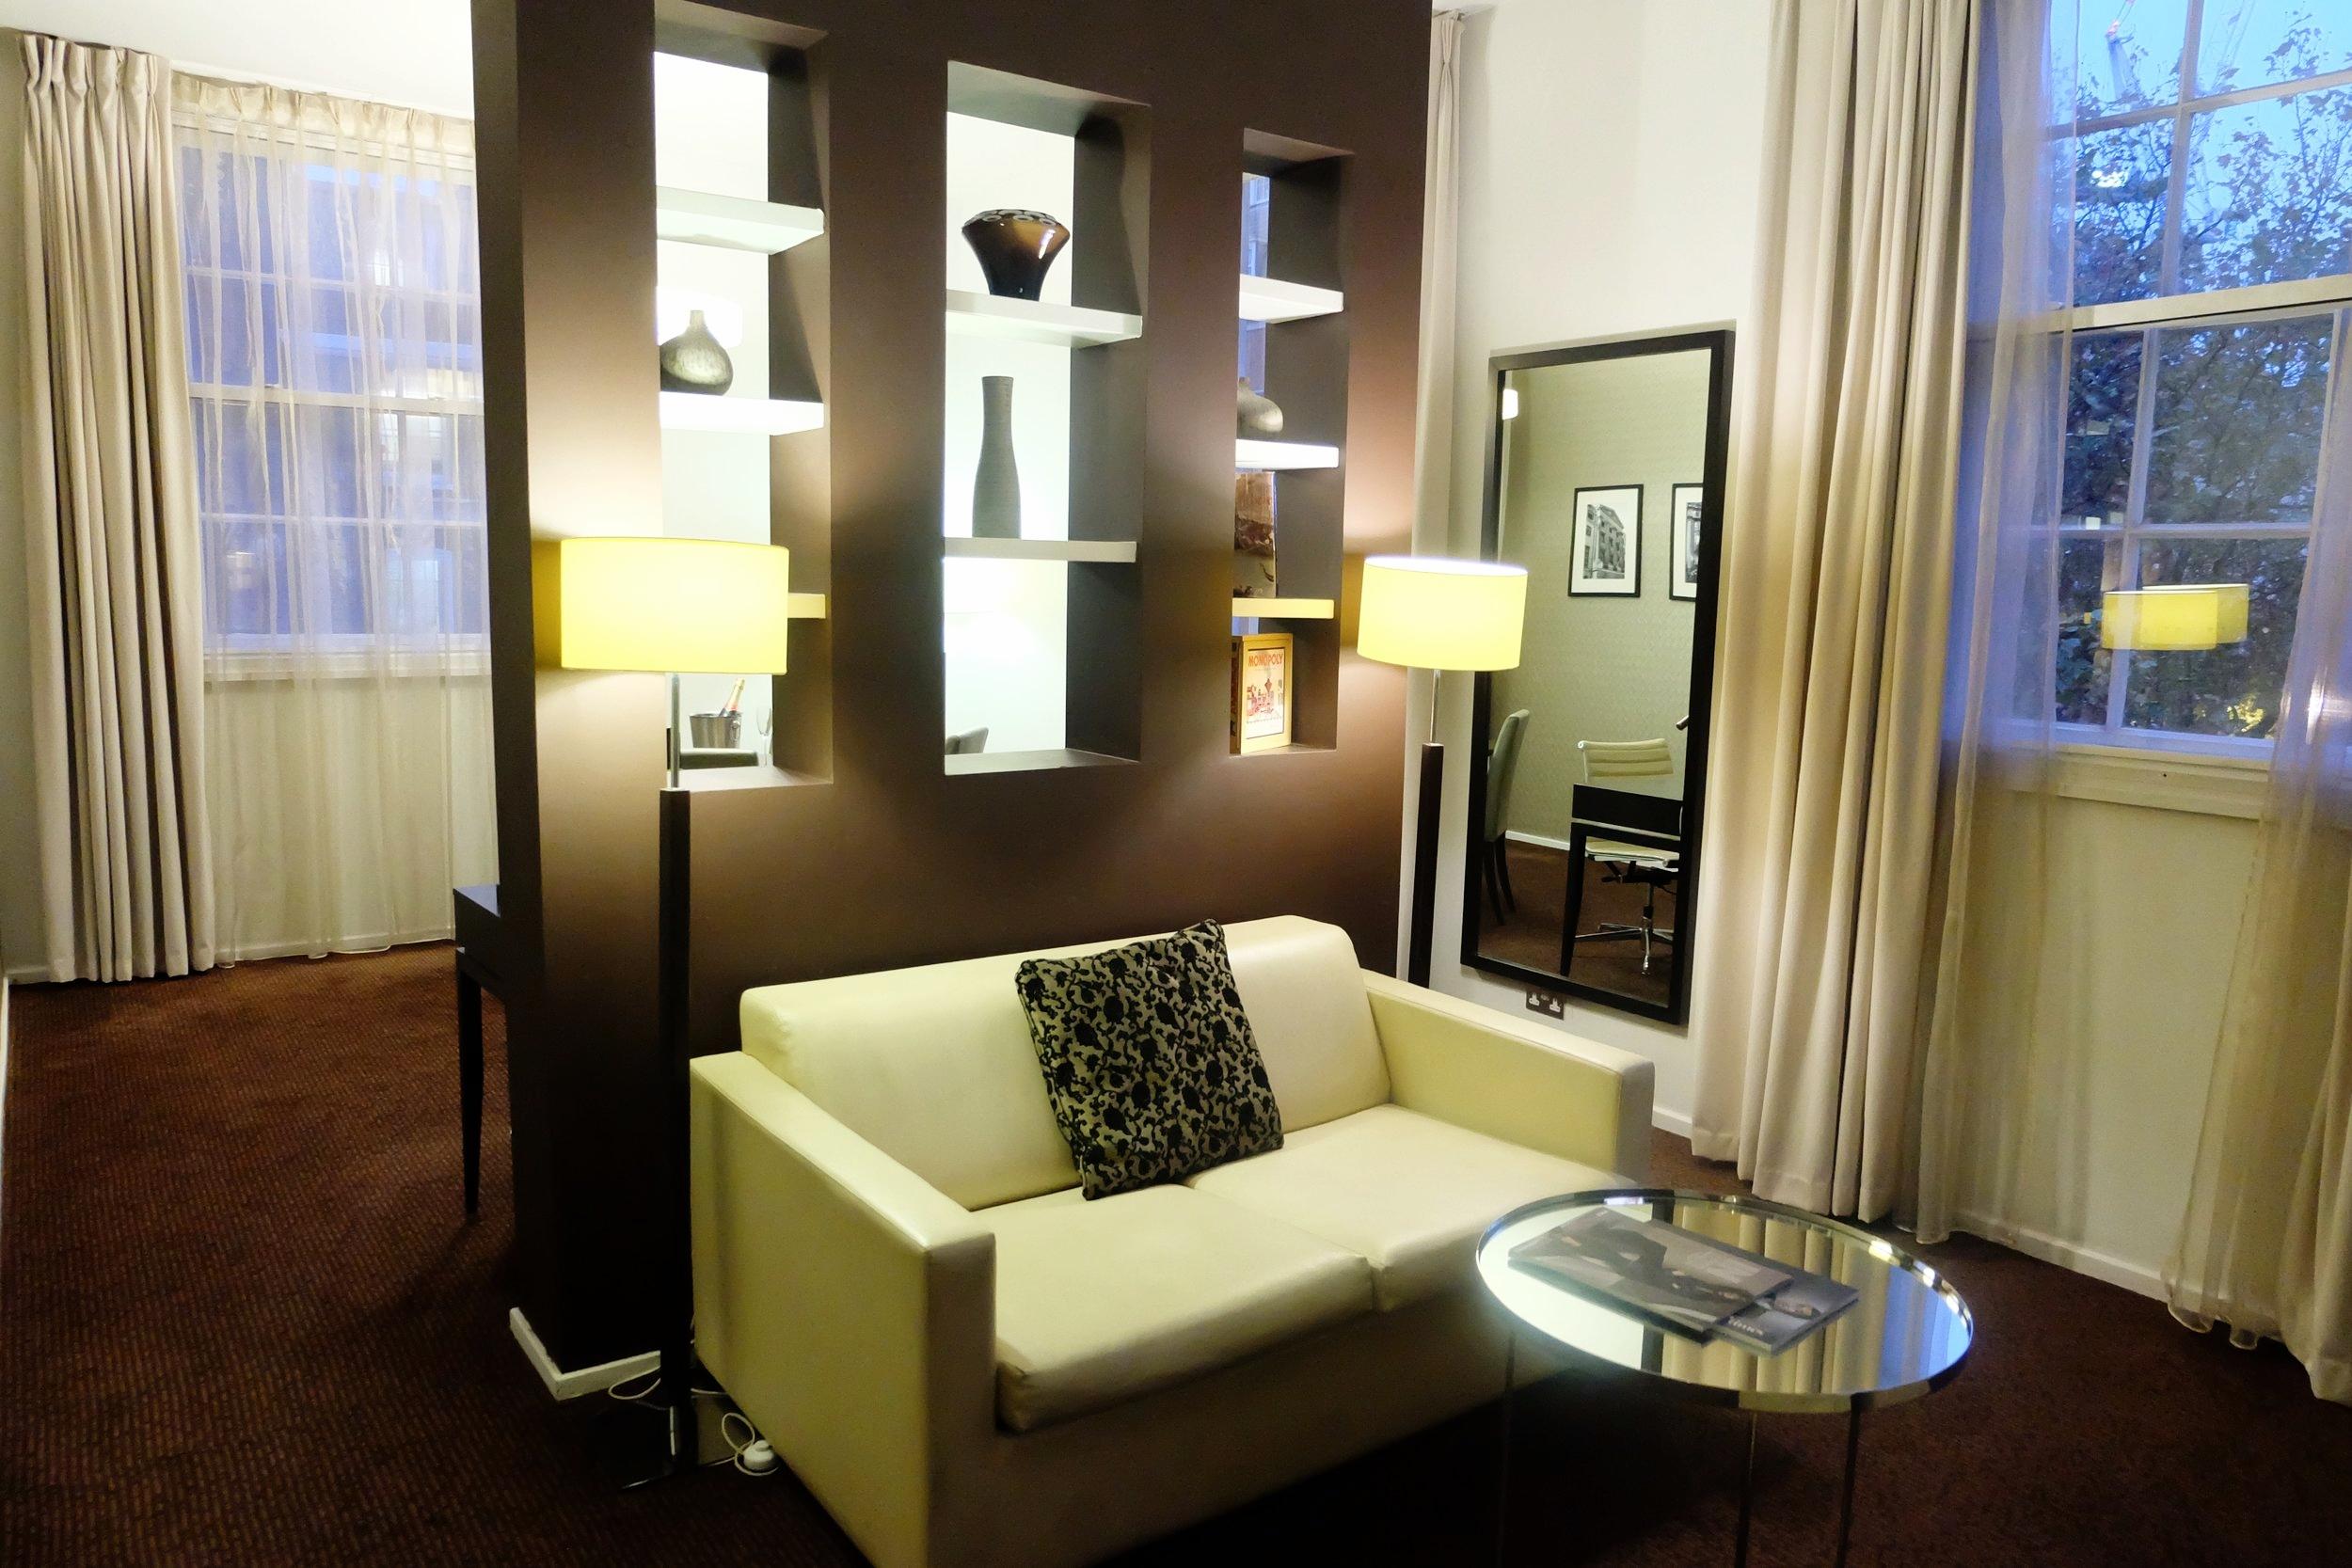 Suite at the London Marriott Hotel Grosvenor Square